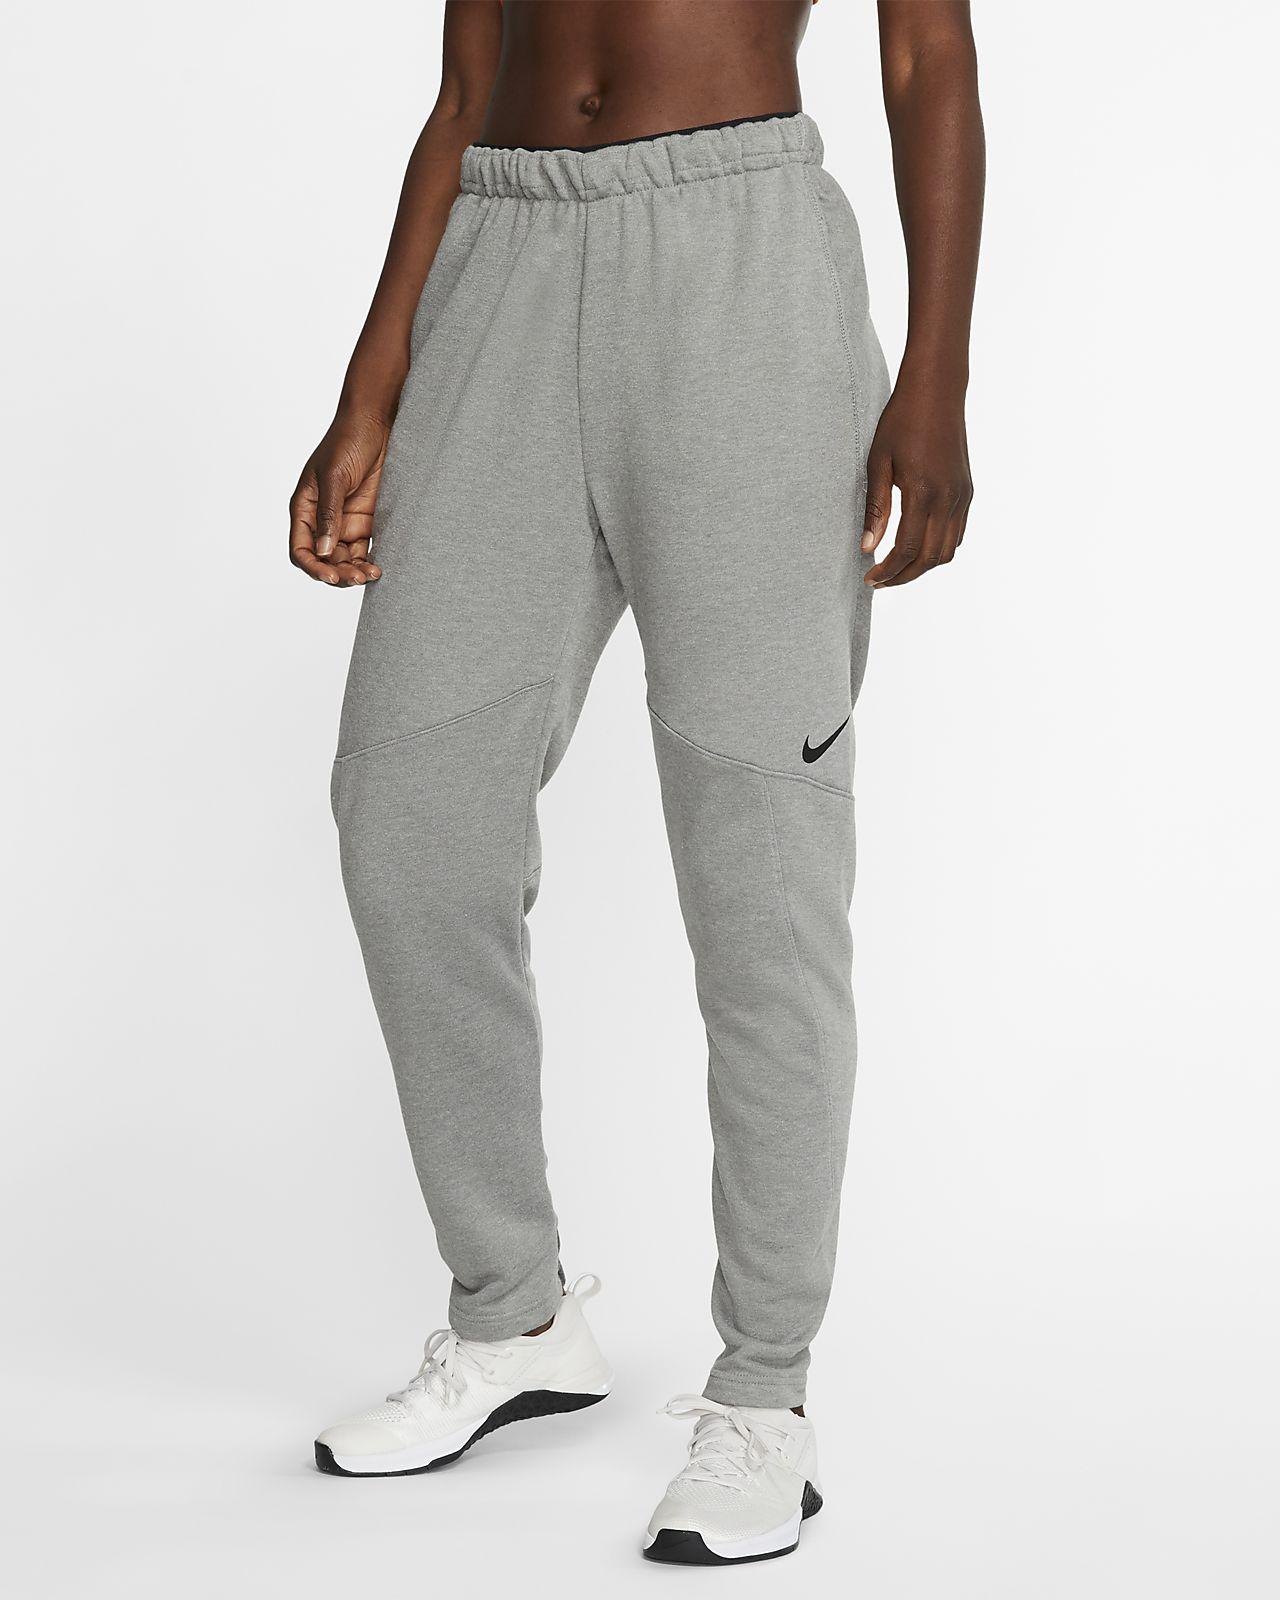 Nike Flux Women's Softball Joggers